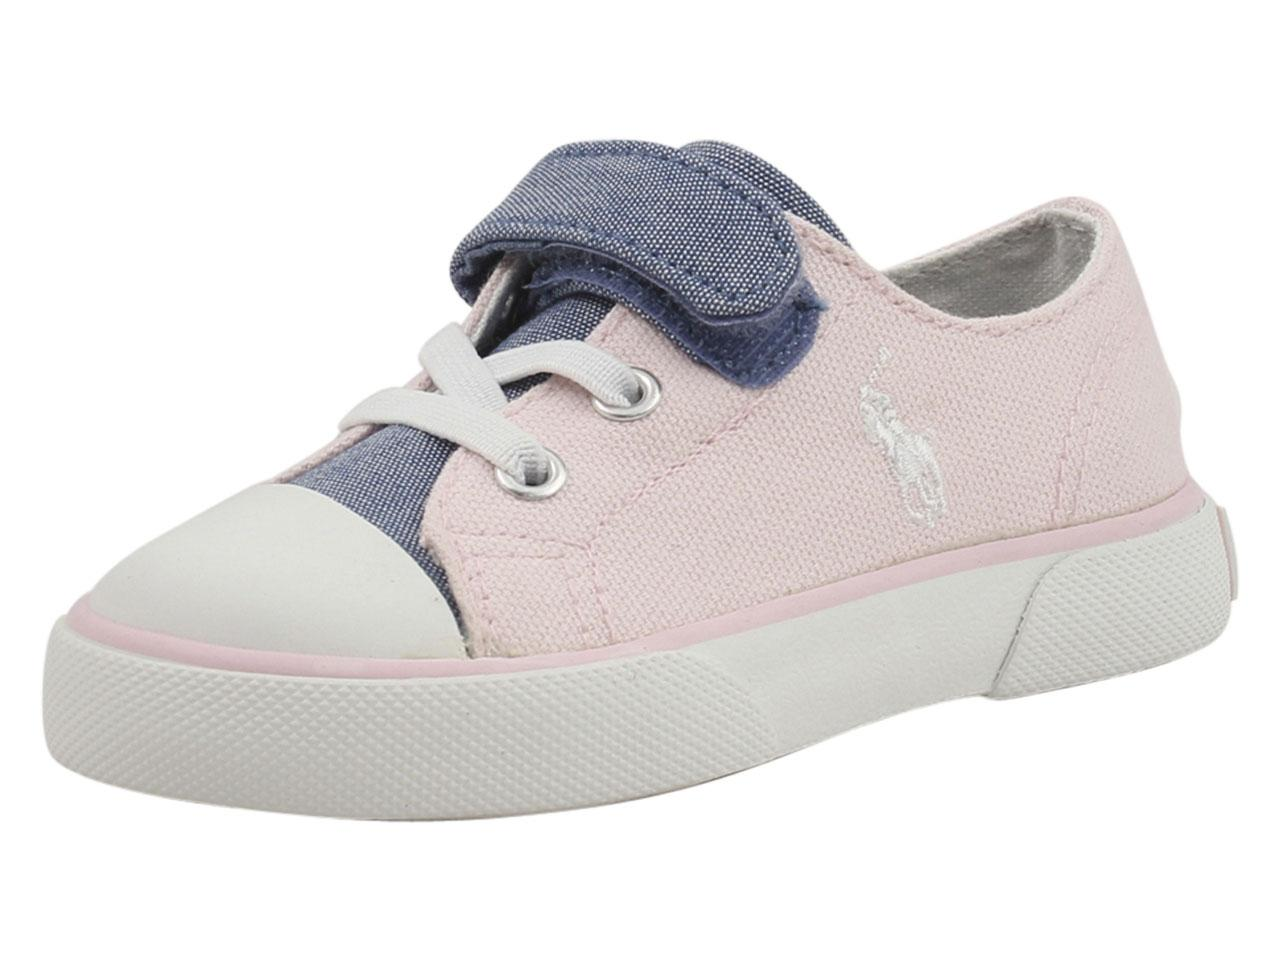 beb36a211 Polo Ralph Lauren Toddler Girl s Koni Sneakers Shoes